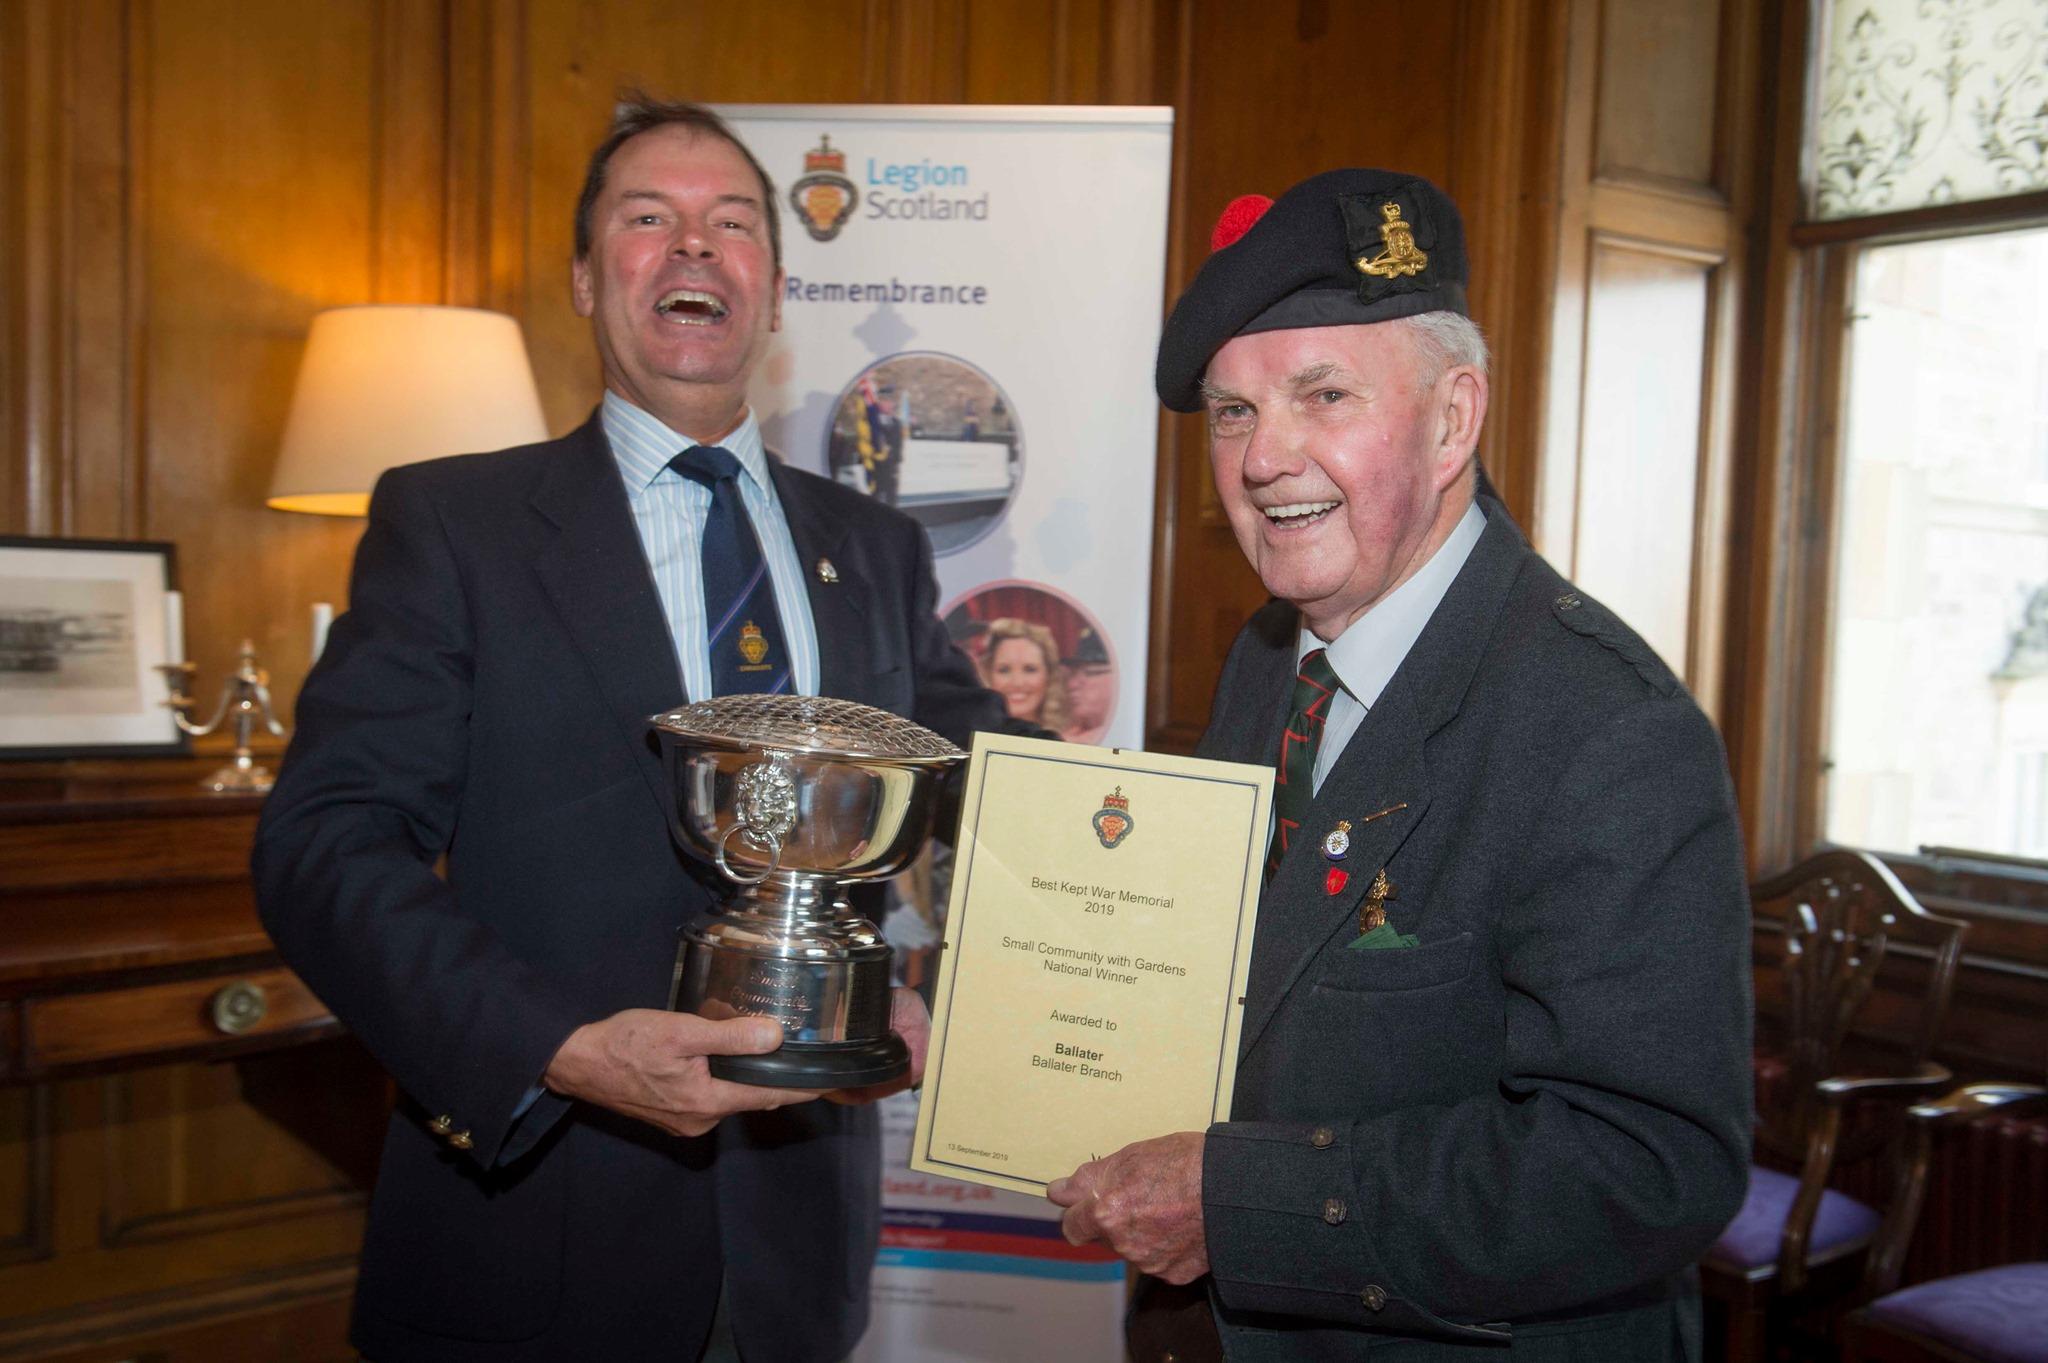 Mr Inkster with Davie Paton from Legion Scotland.